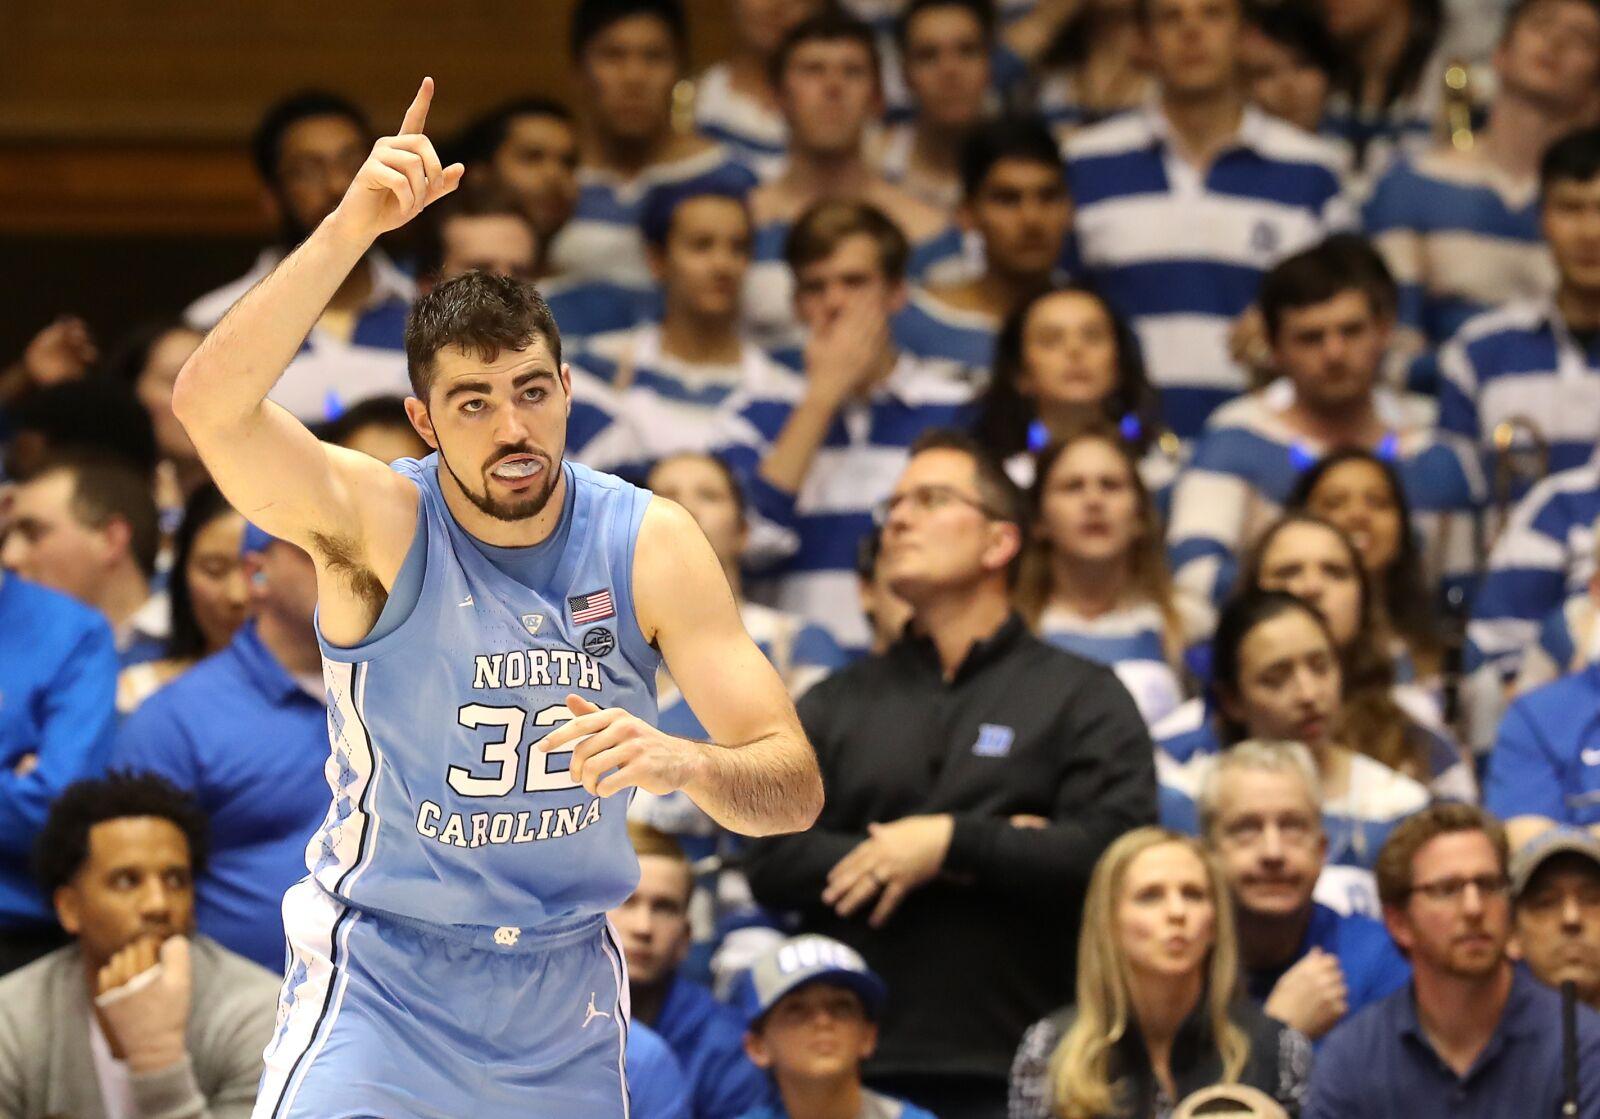 Florida State vs. North Carolina live stream: Watch college basketball online